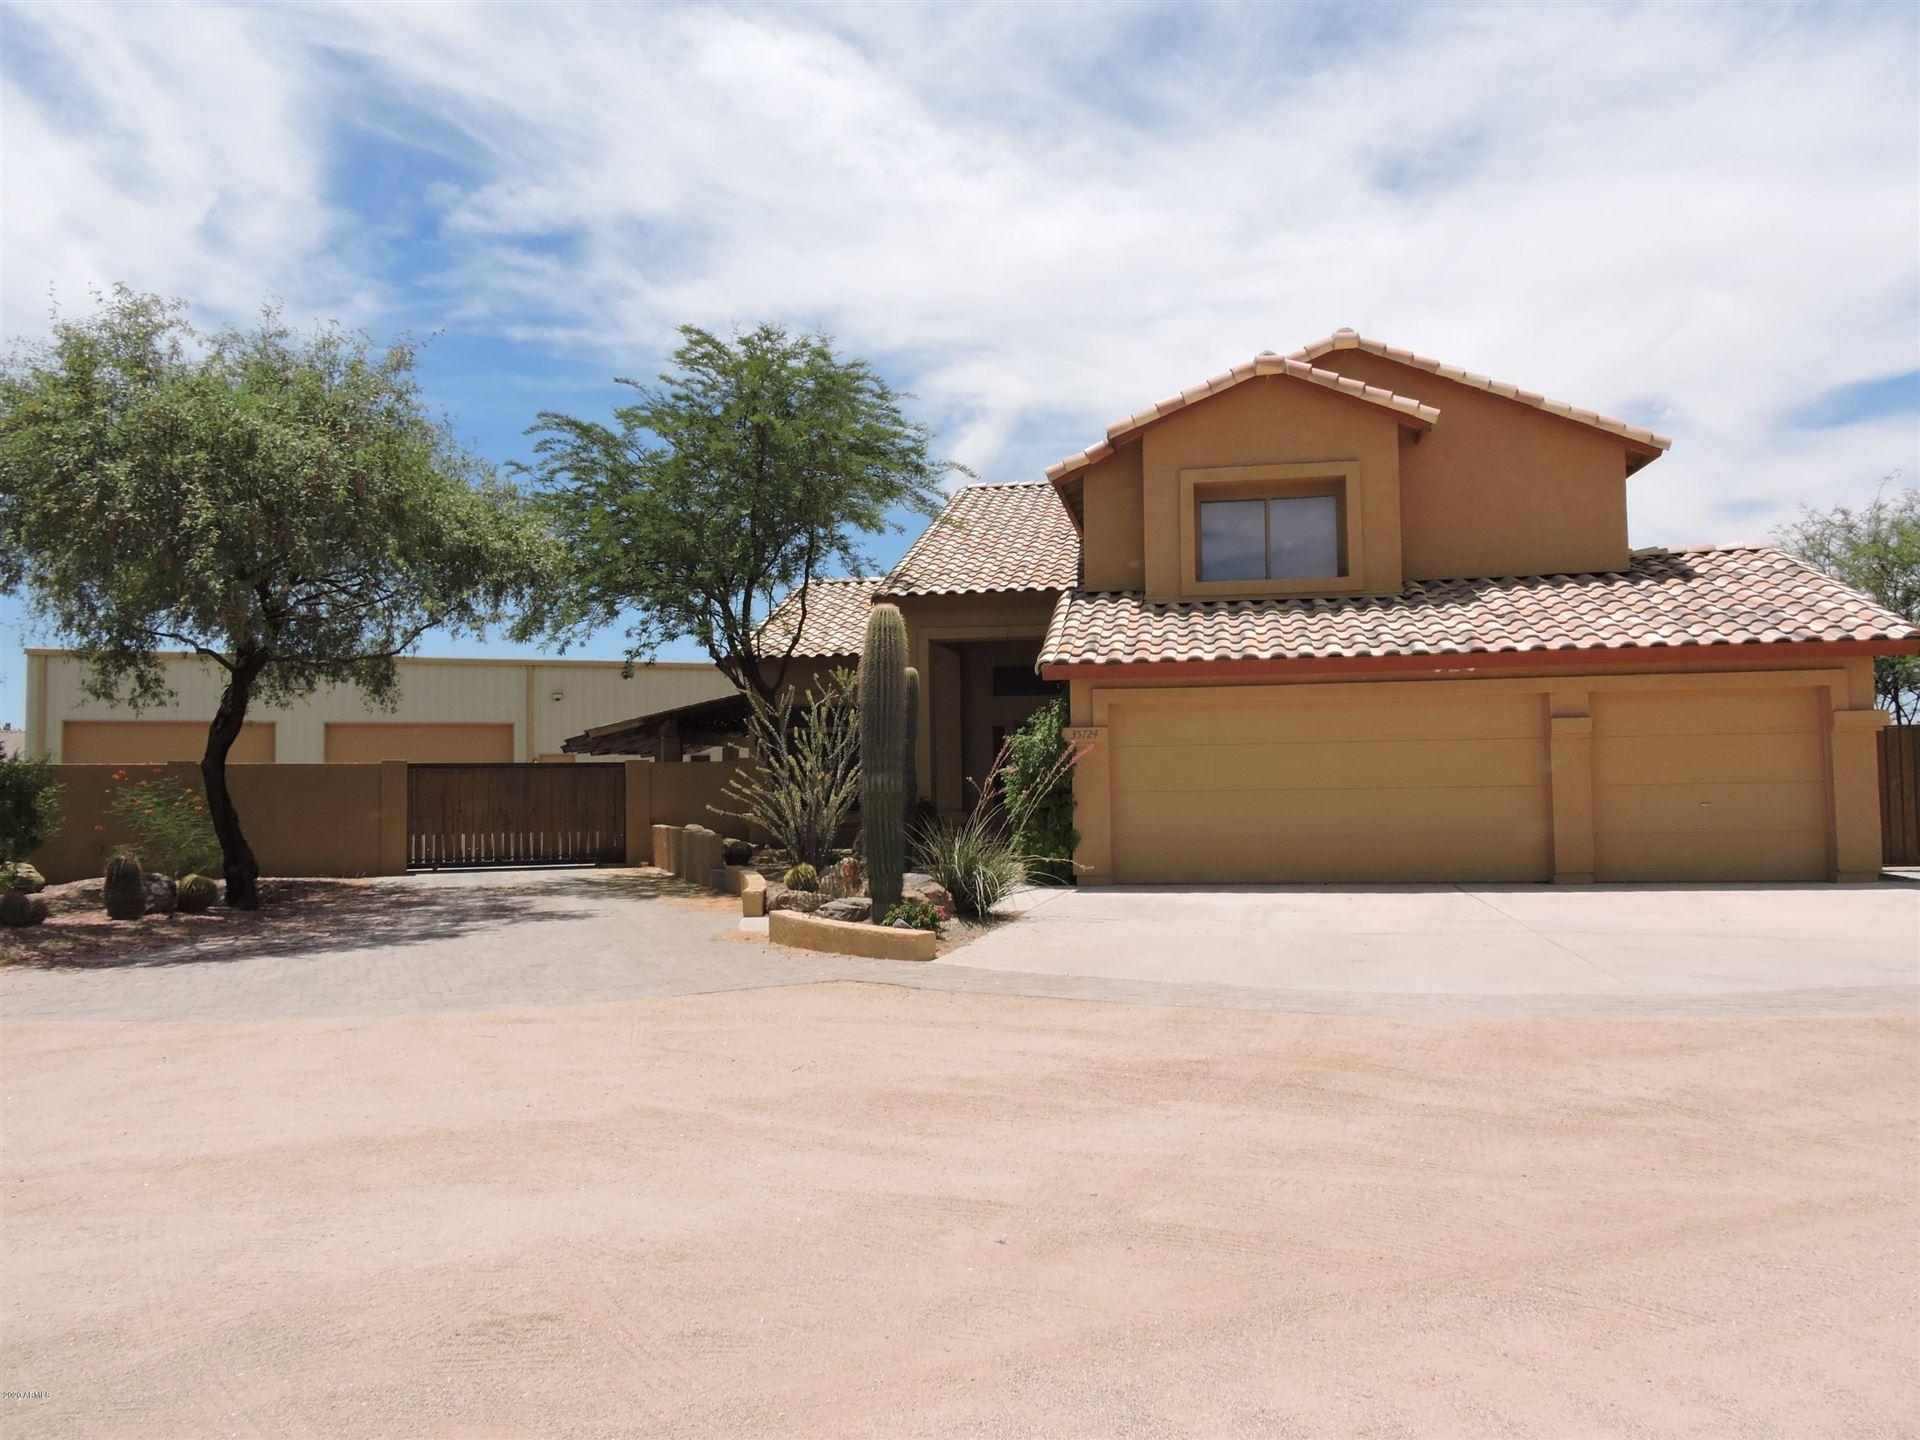 35724 N 7TH Avenue, Phoenix, AZ 85086 - MLS#: 6105792